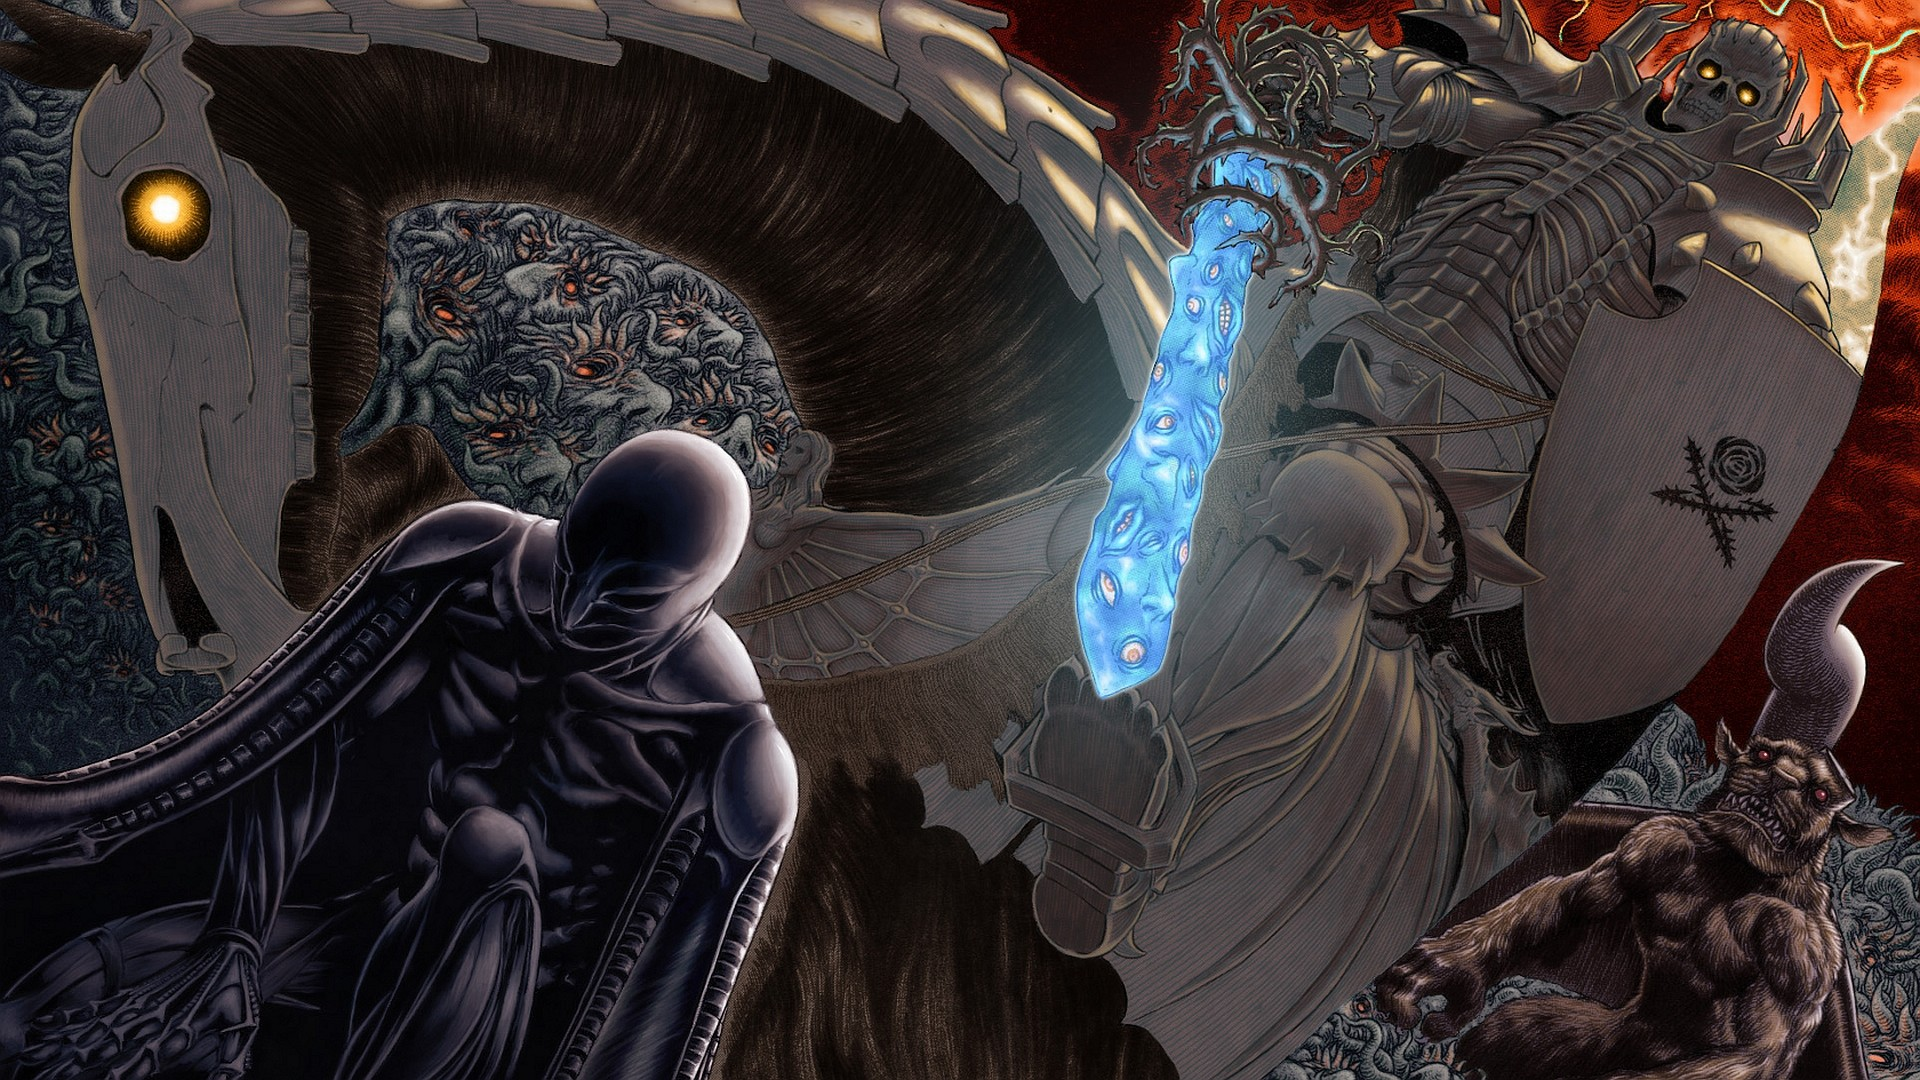 Anime – Berserk Dark Raven Sword Wallpaper